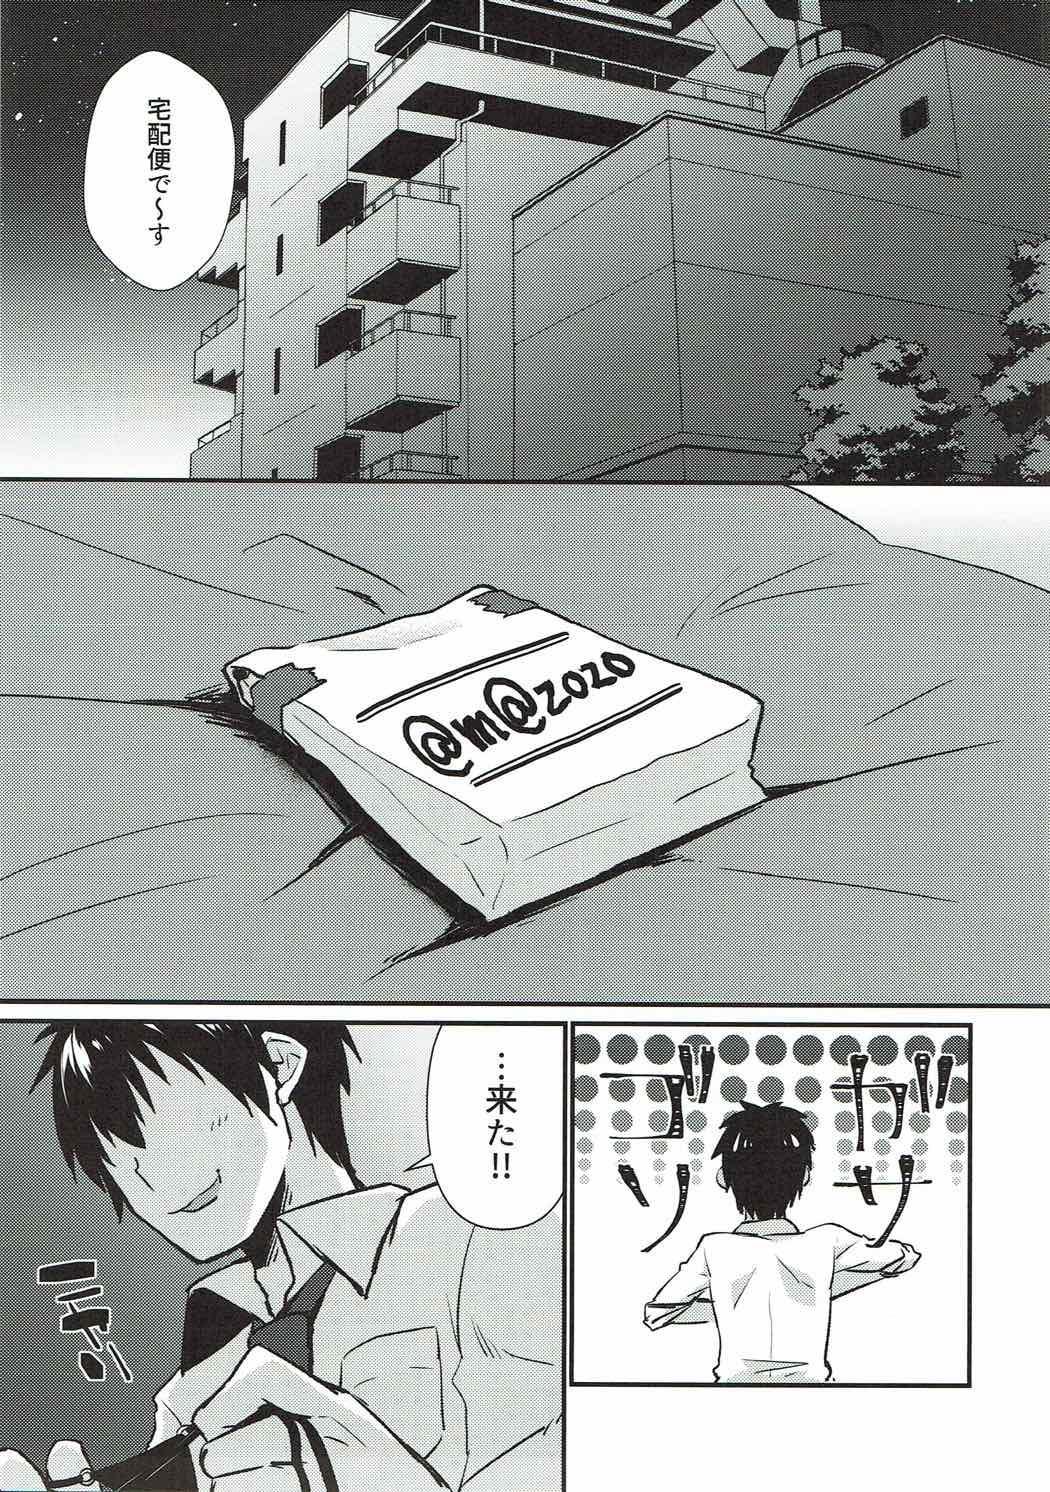 Syuko to Nurunuru Ichaicha Massage 3